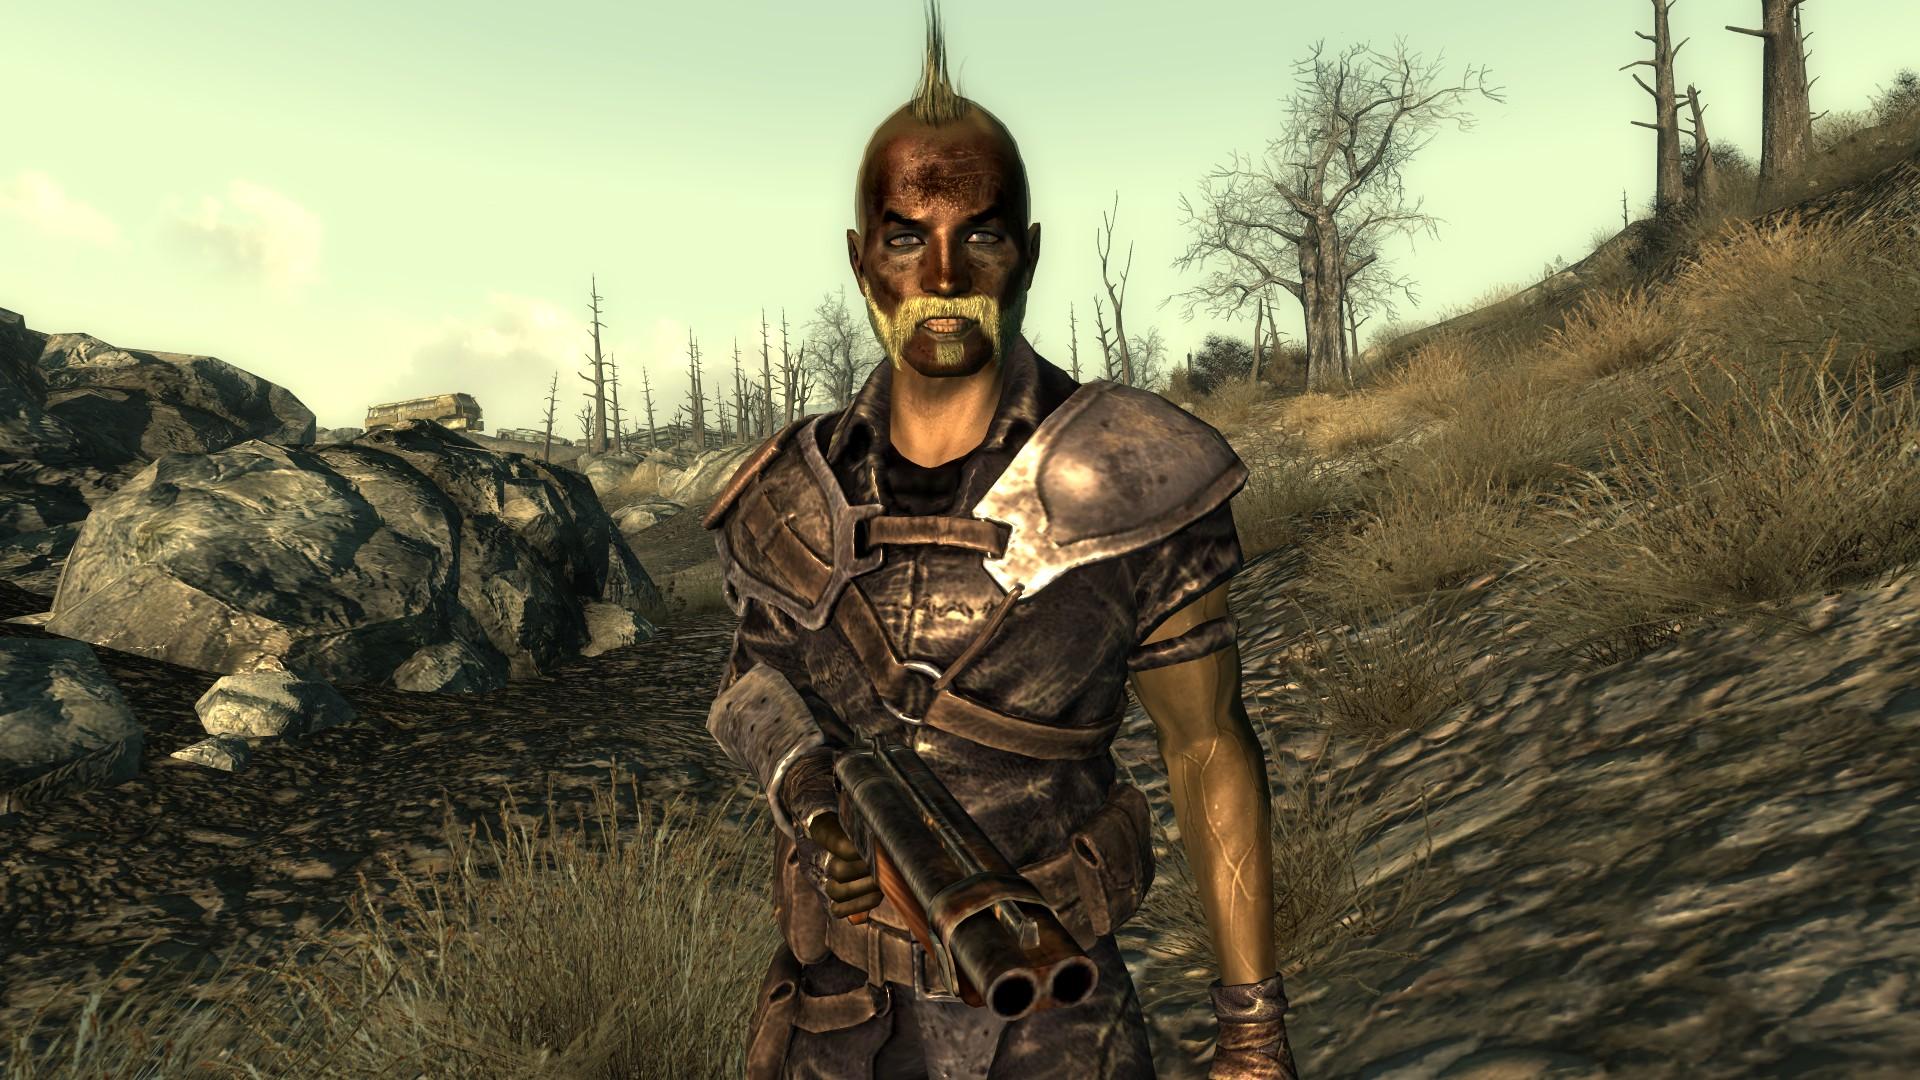 Wanderer (character) | Fallout Wiki | FANDOM powered by Wikia